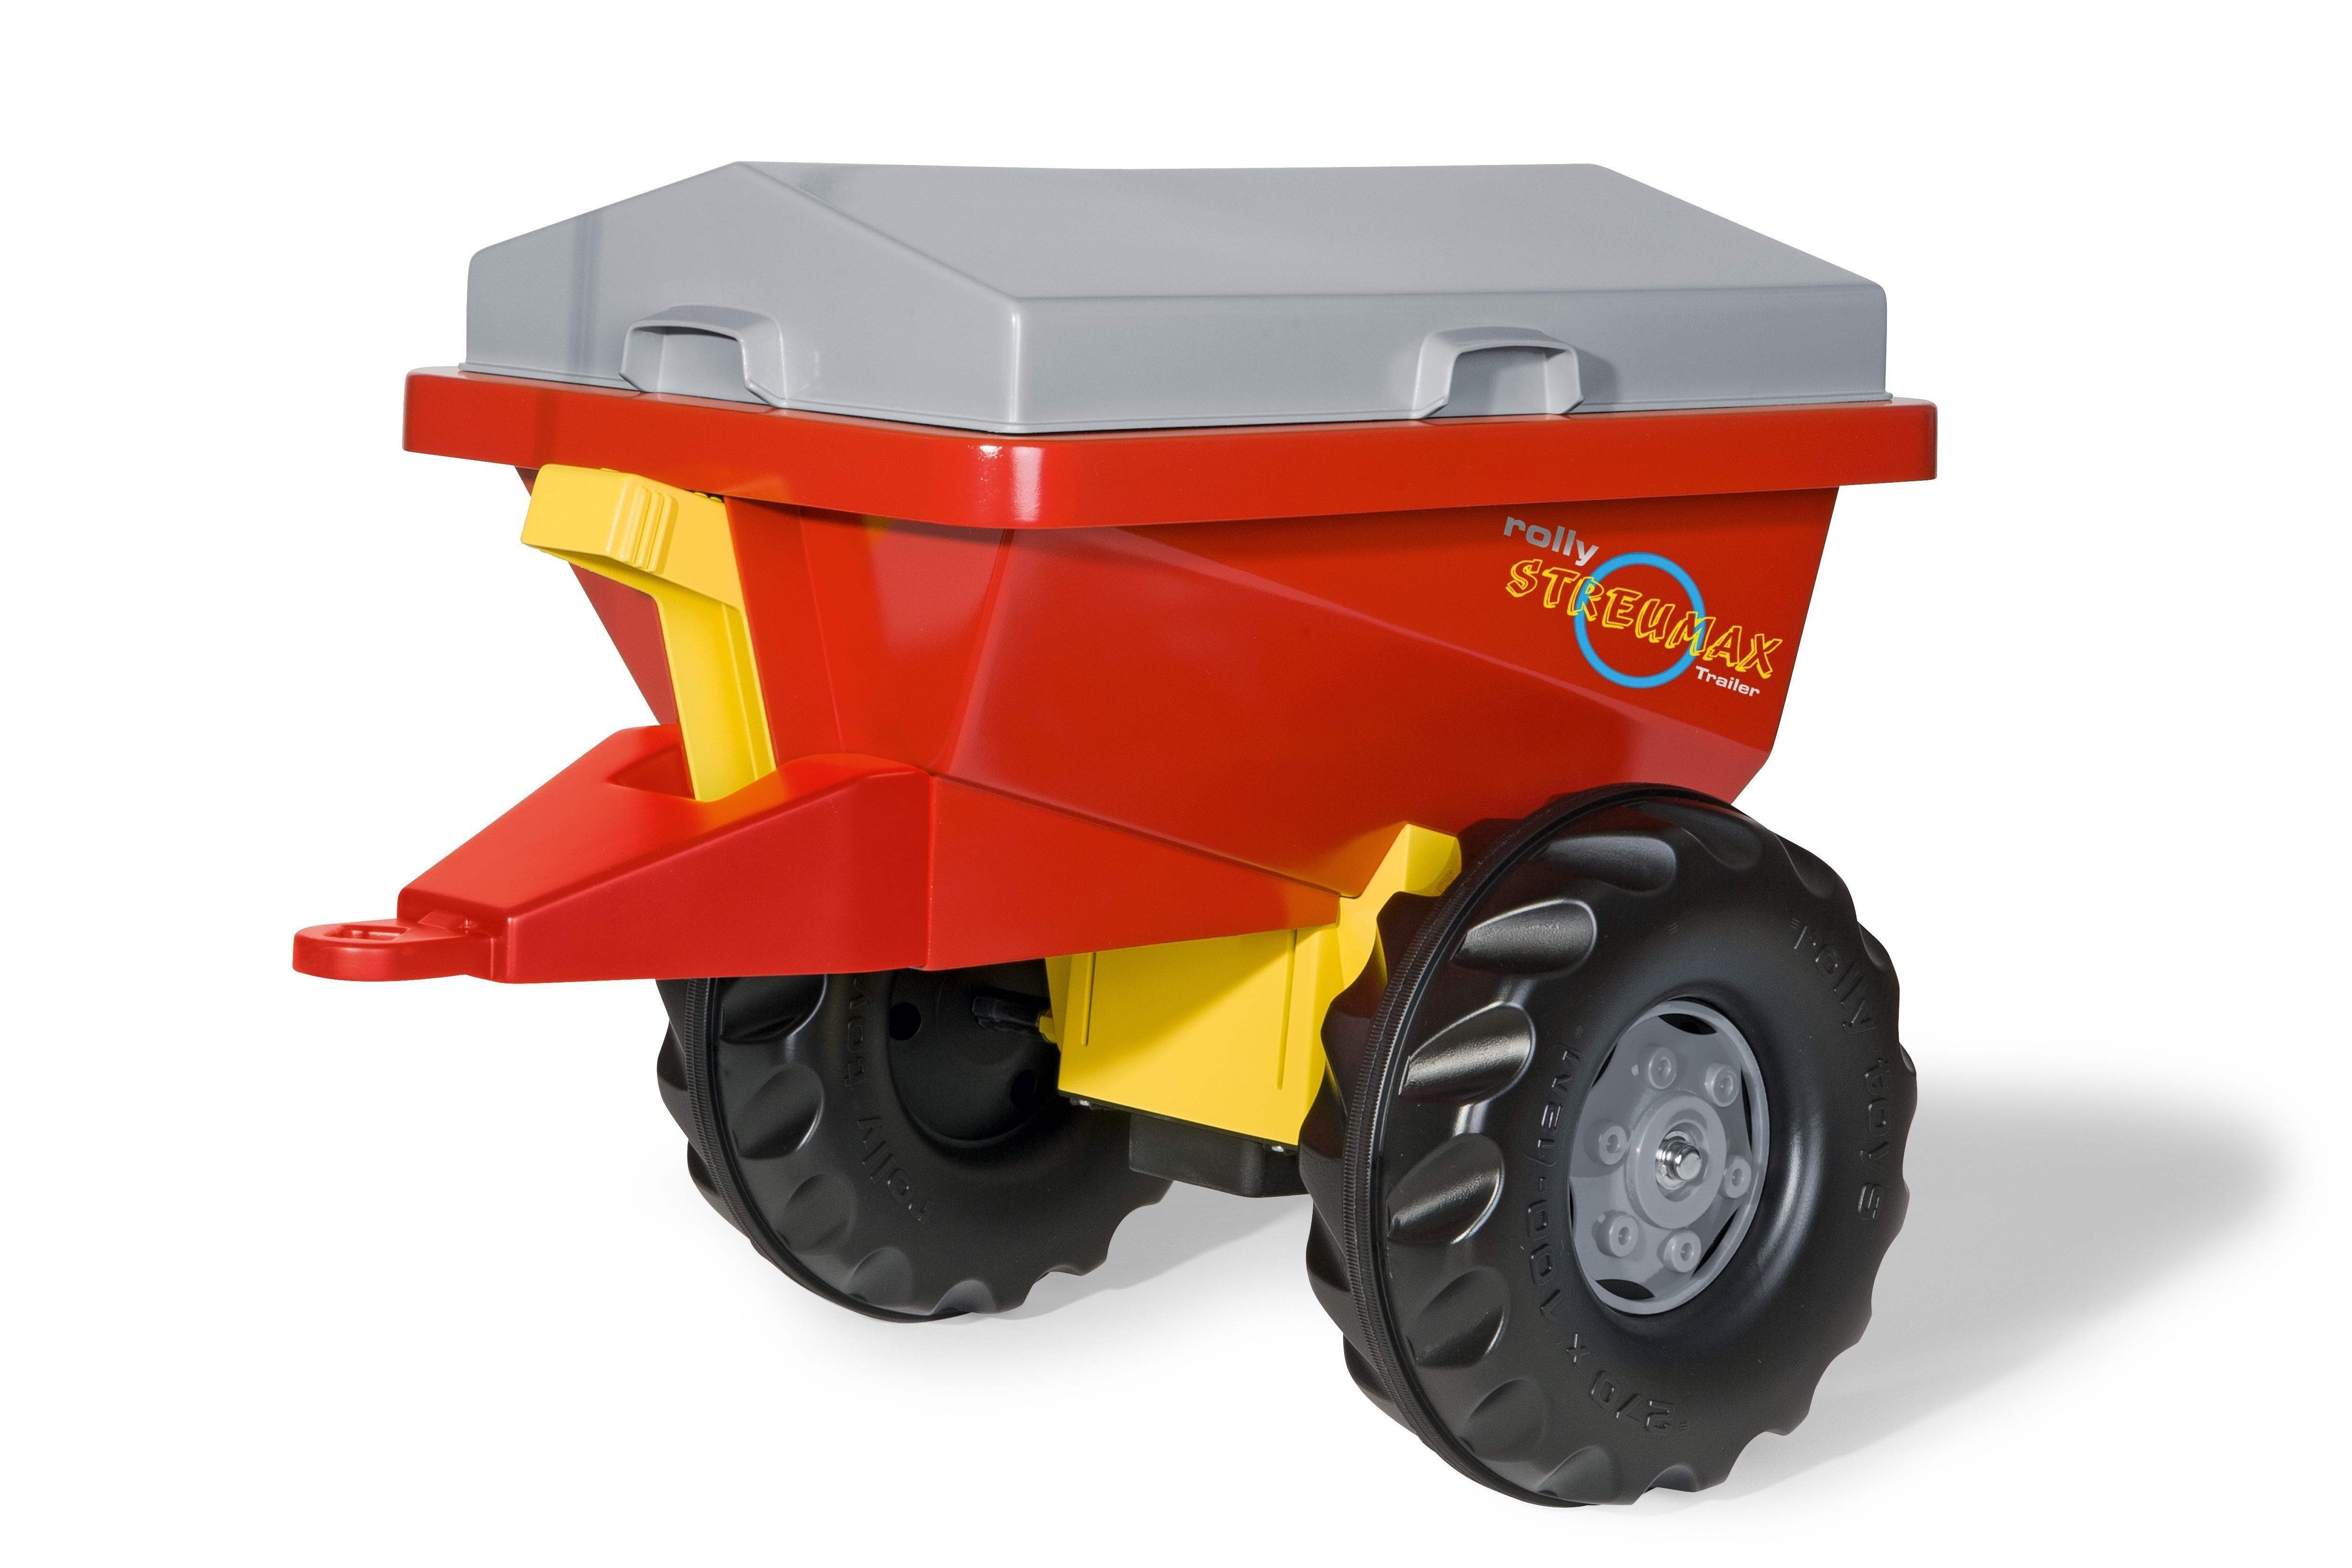 Anhänger für Tretfahrzeug rolly Streumax rot - Rolly Toys Bild 1